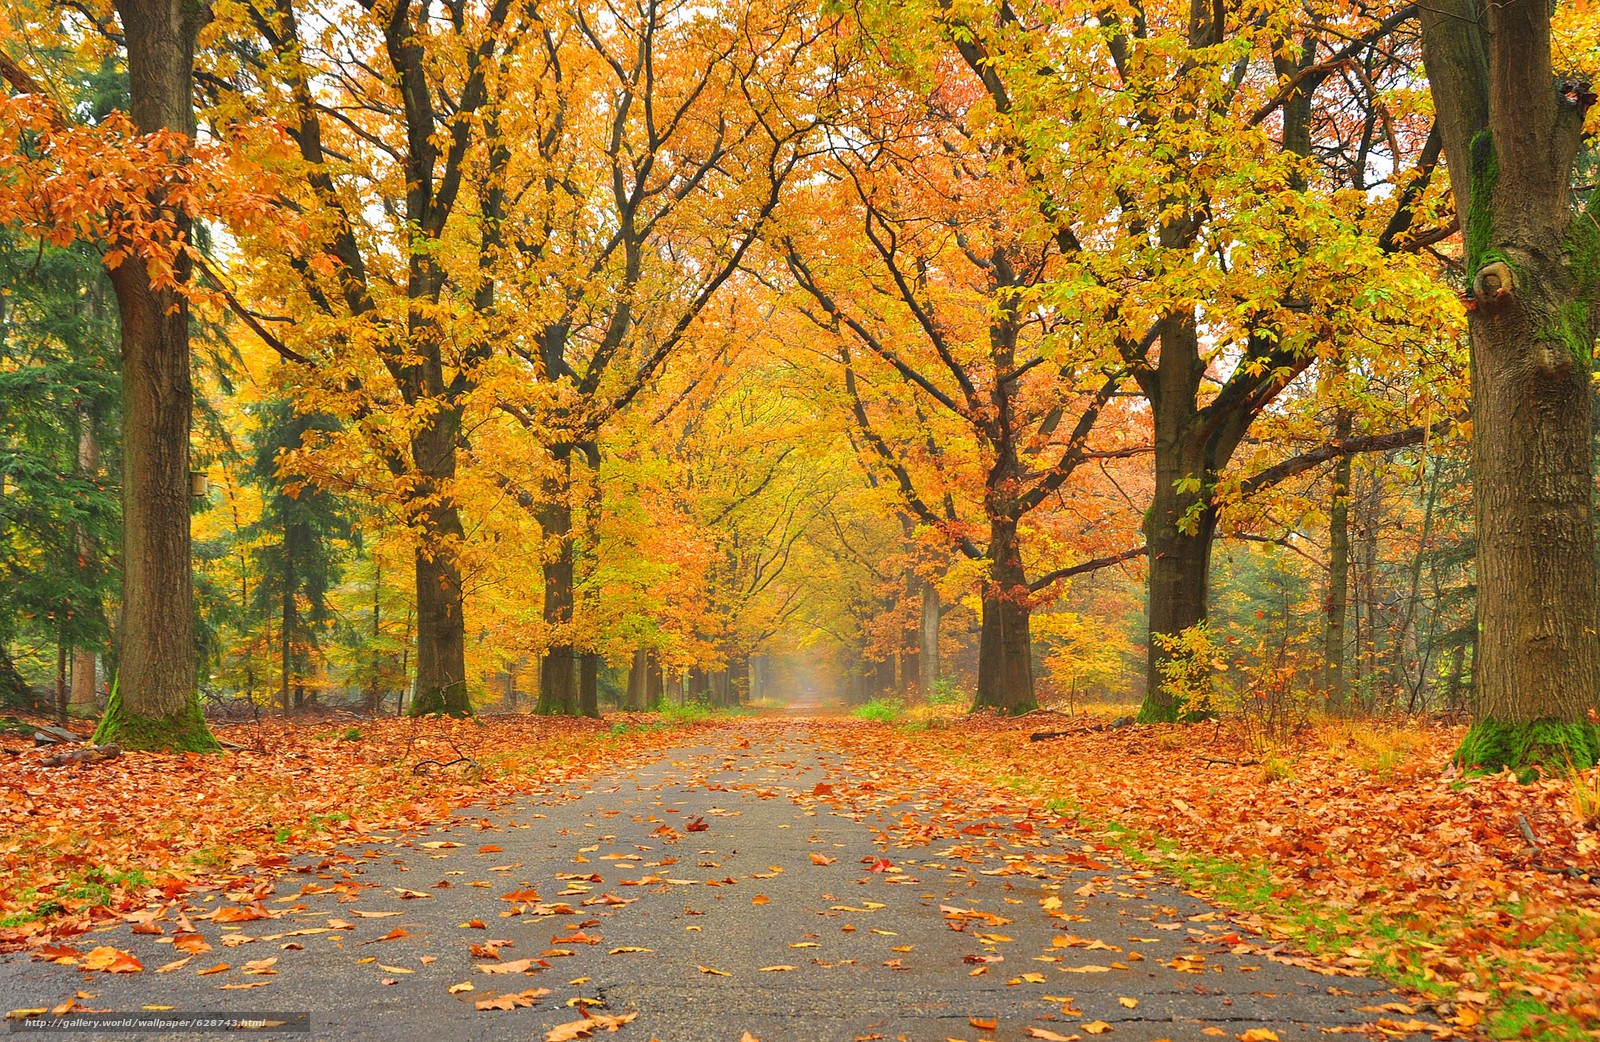 осень, дорога, деревья, парк, пейзаж